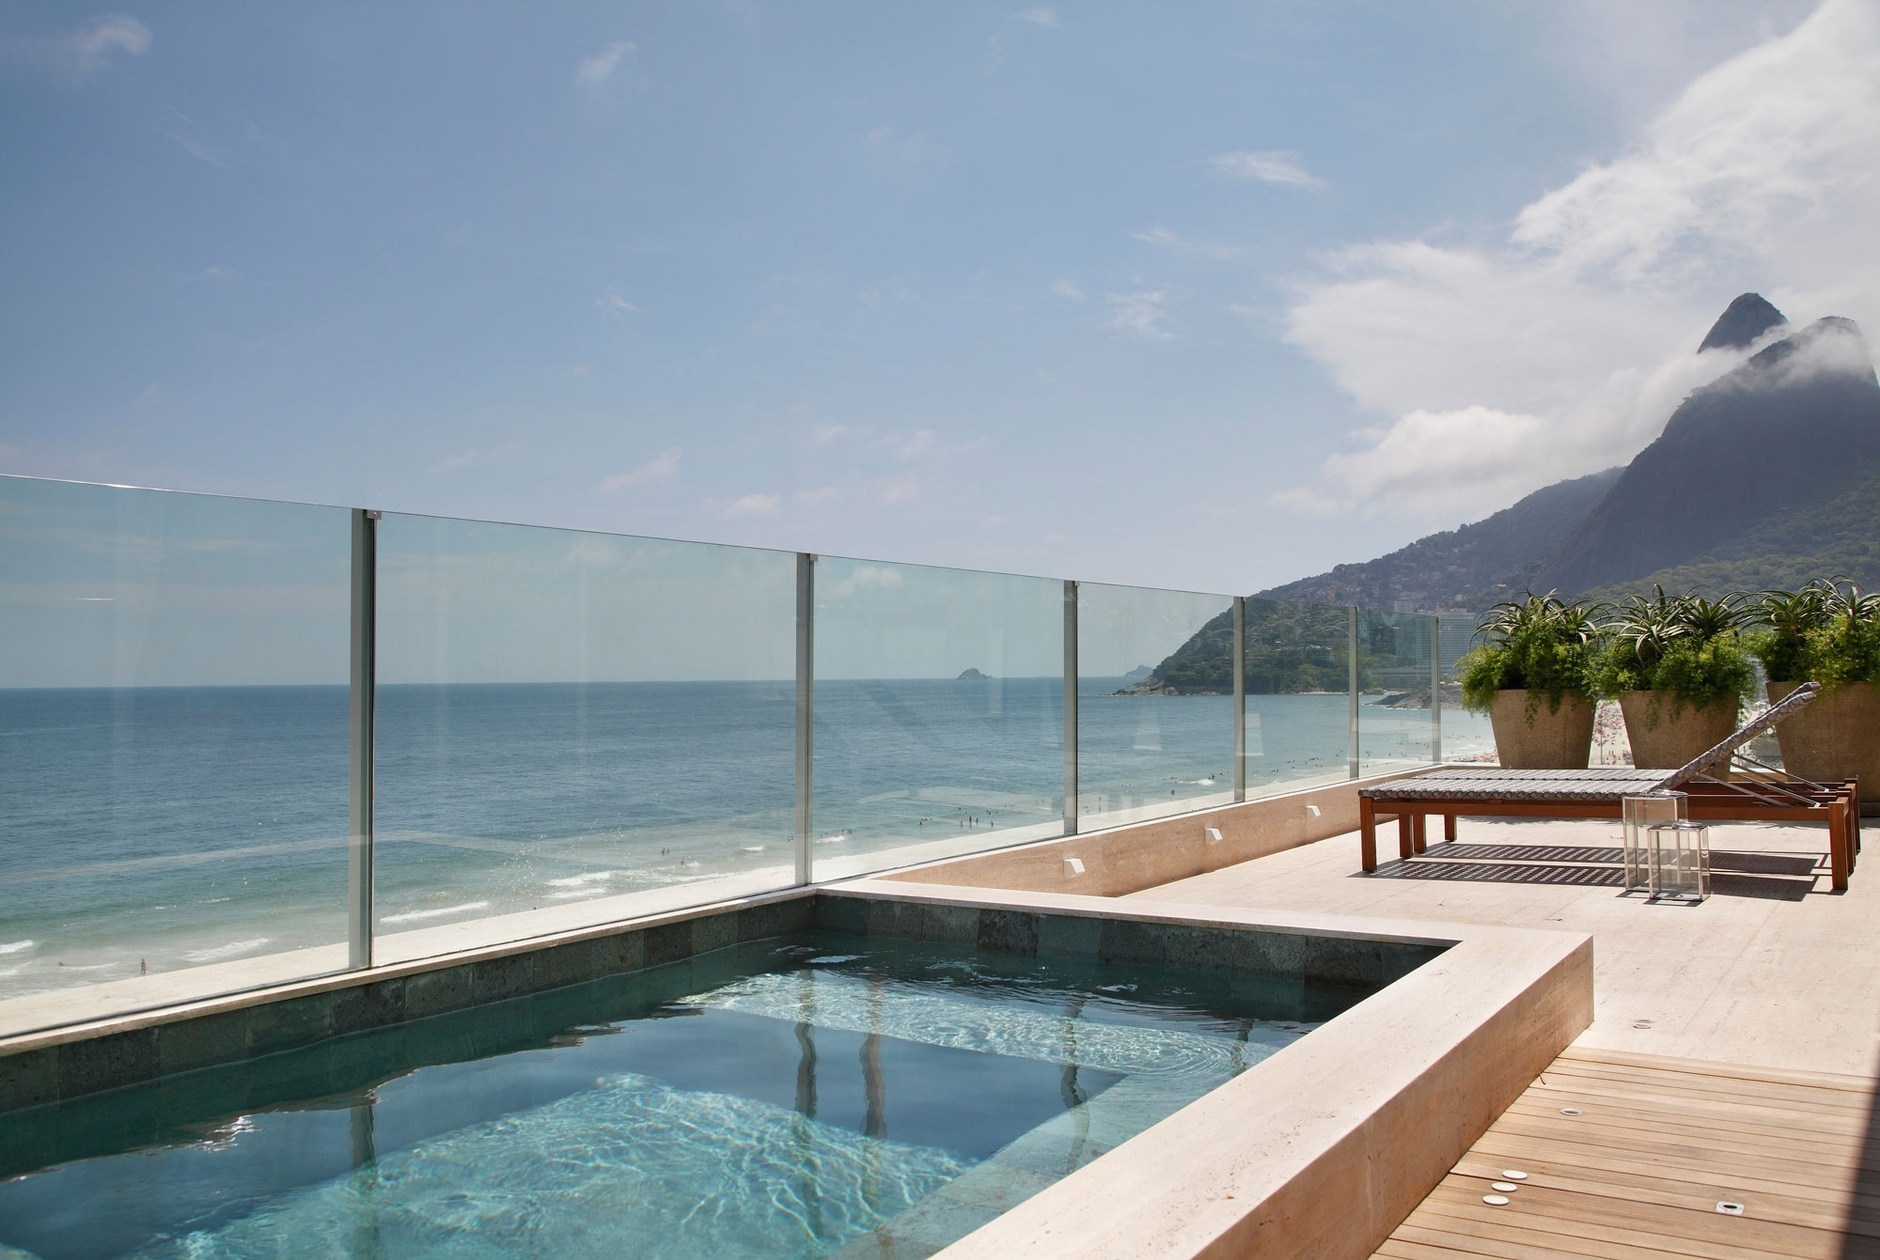 Cobertura triplex by izabela lessa arquitetura karmatrendz for Cobertura piscina